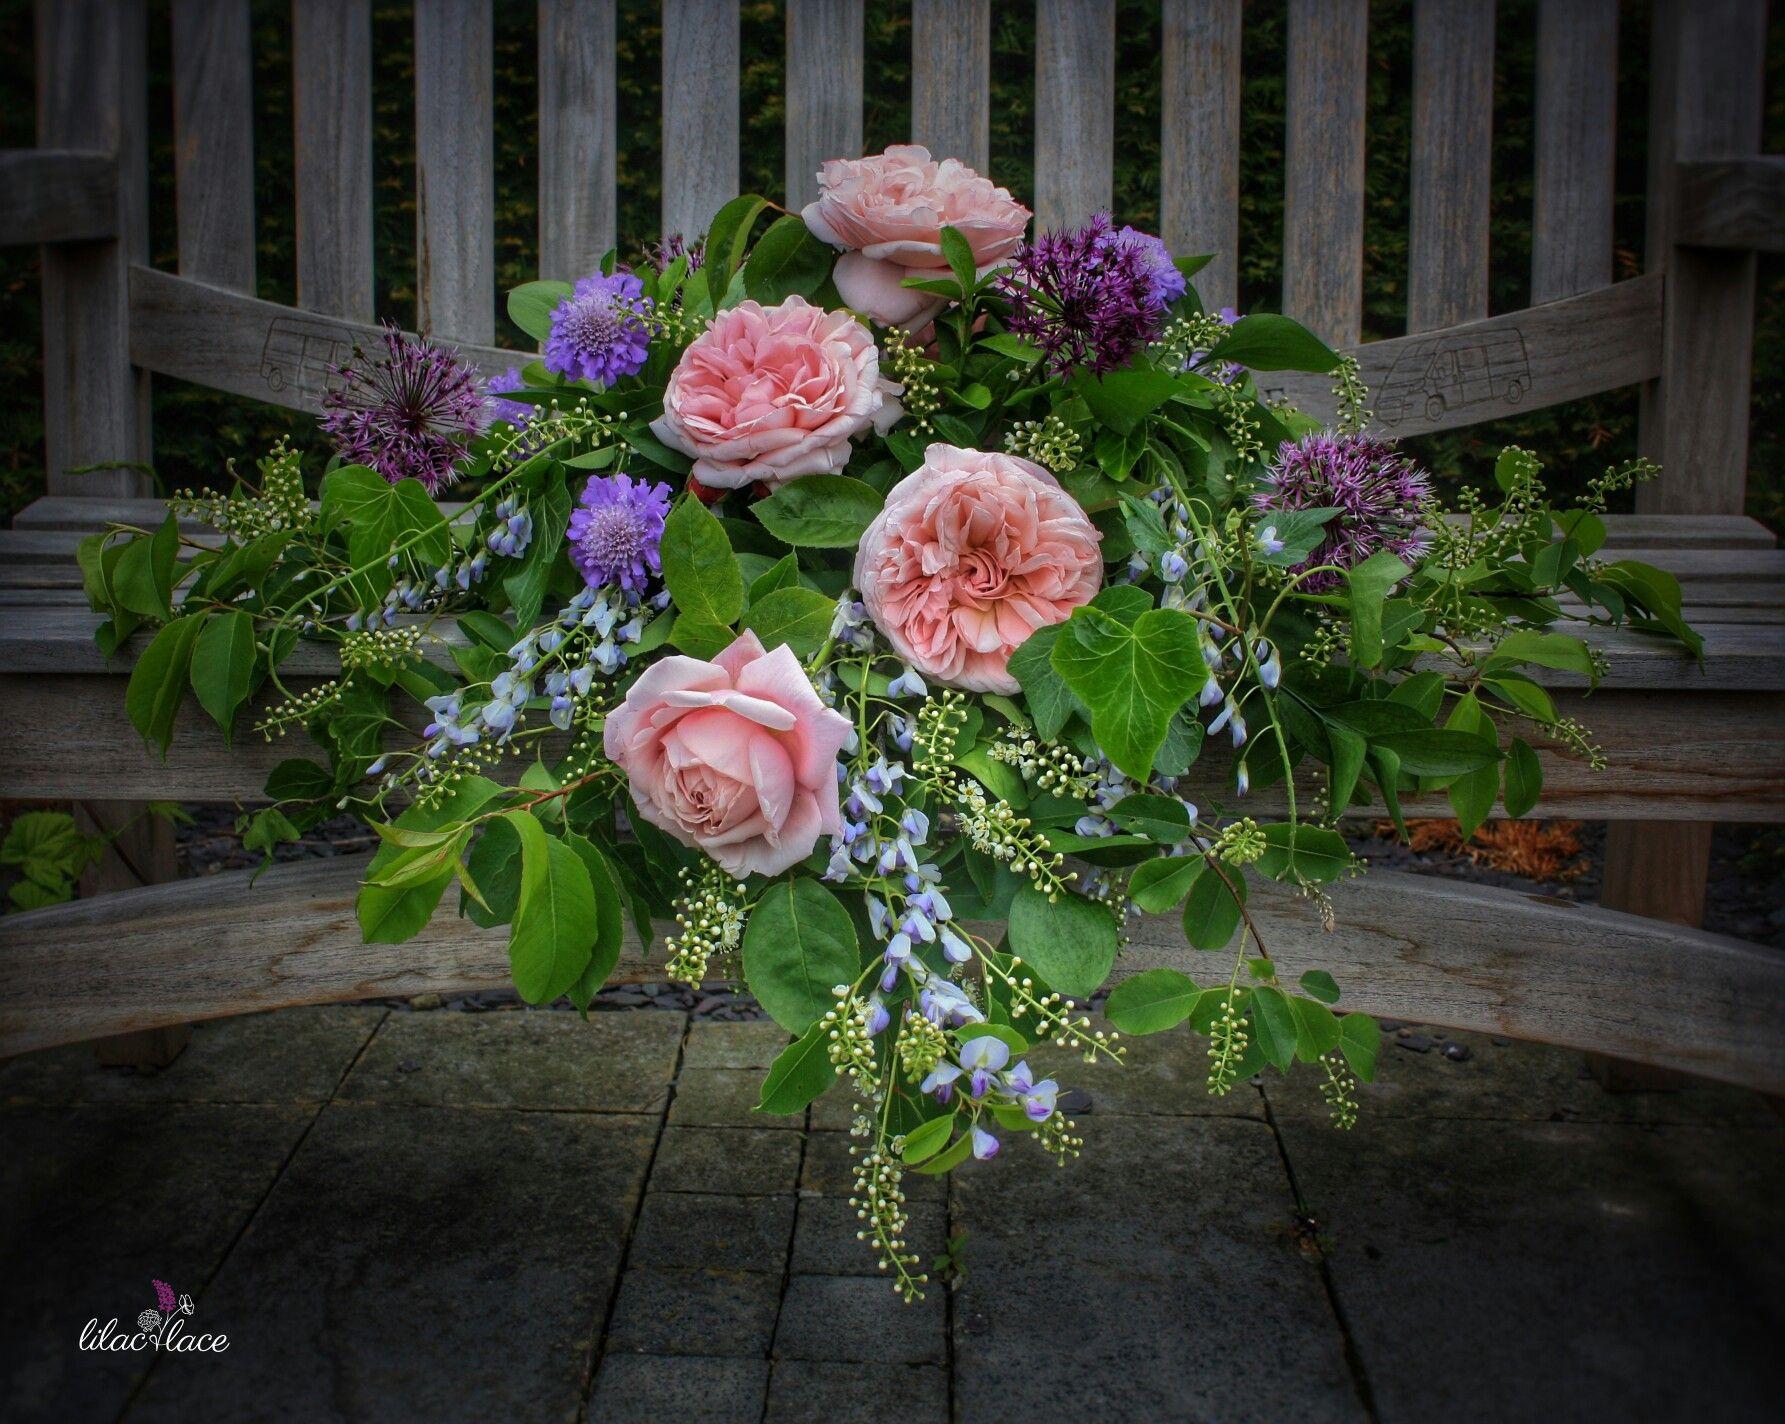 Wedding Top Tables Wedding Tops Wedding Centrepieces Centerpieces David Austin Roses Wisteria Lilac Floral Designs Wedding Center Pieces